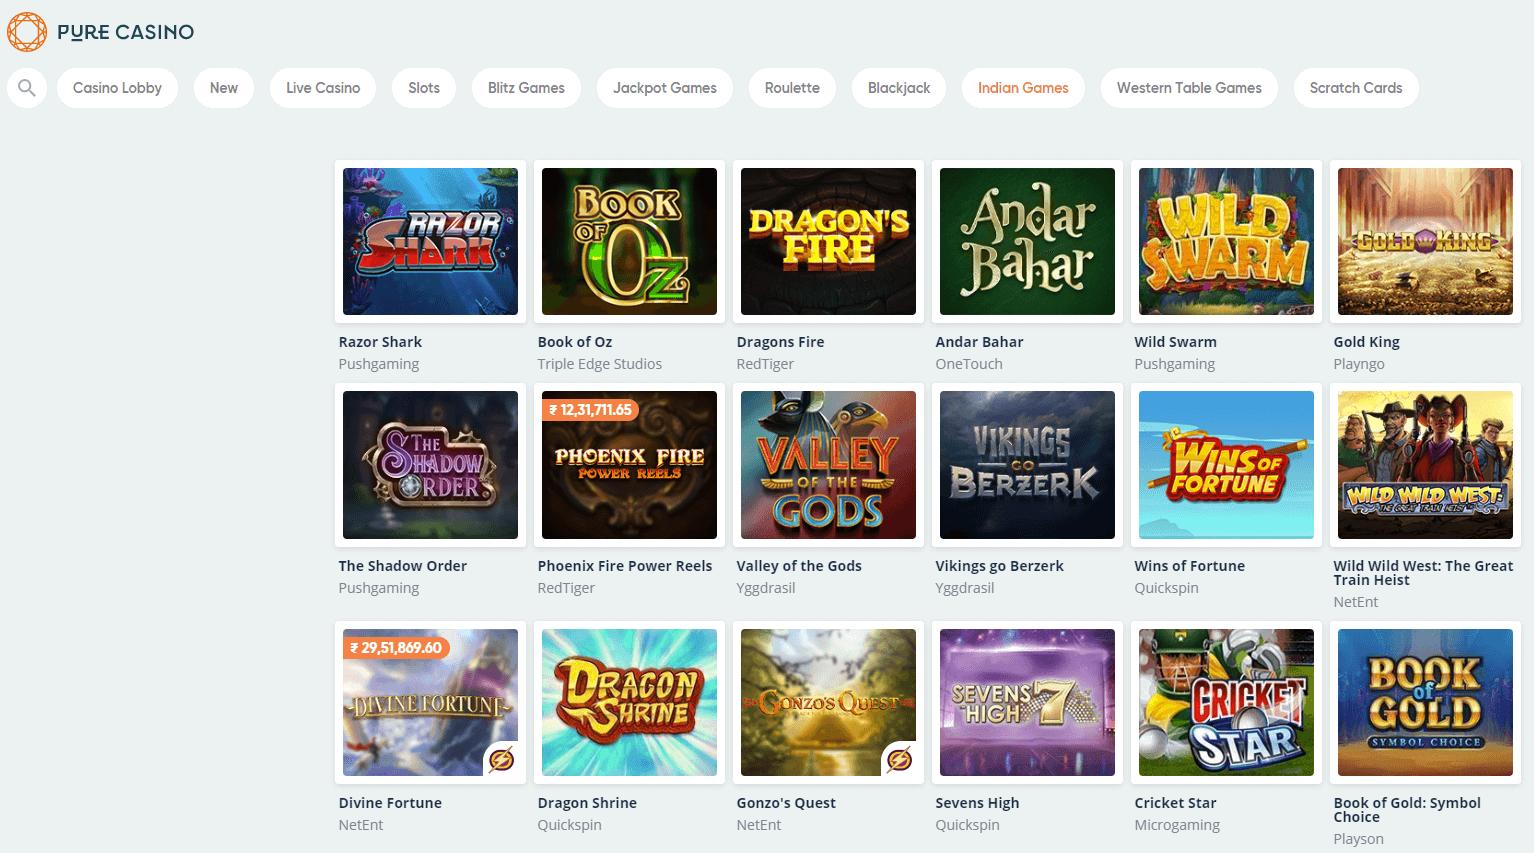 screenshot of the casino games at pure casino